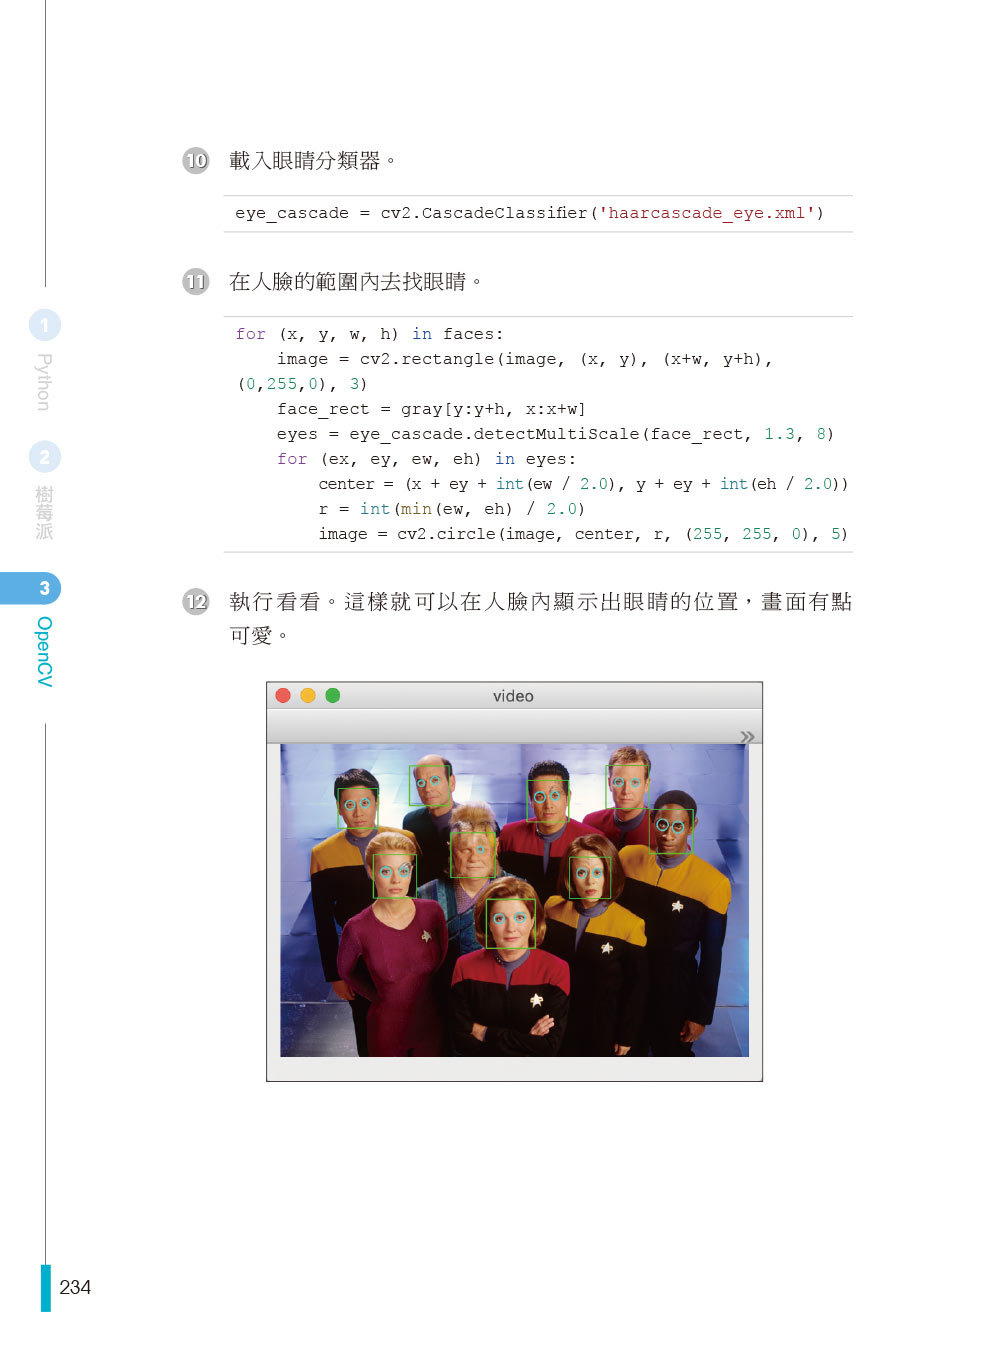 AIOT 與 OpenCV 實戰應用:Python、樹莓派、物聯網與機器視覺, 2/e-preview-6